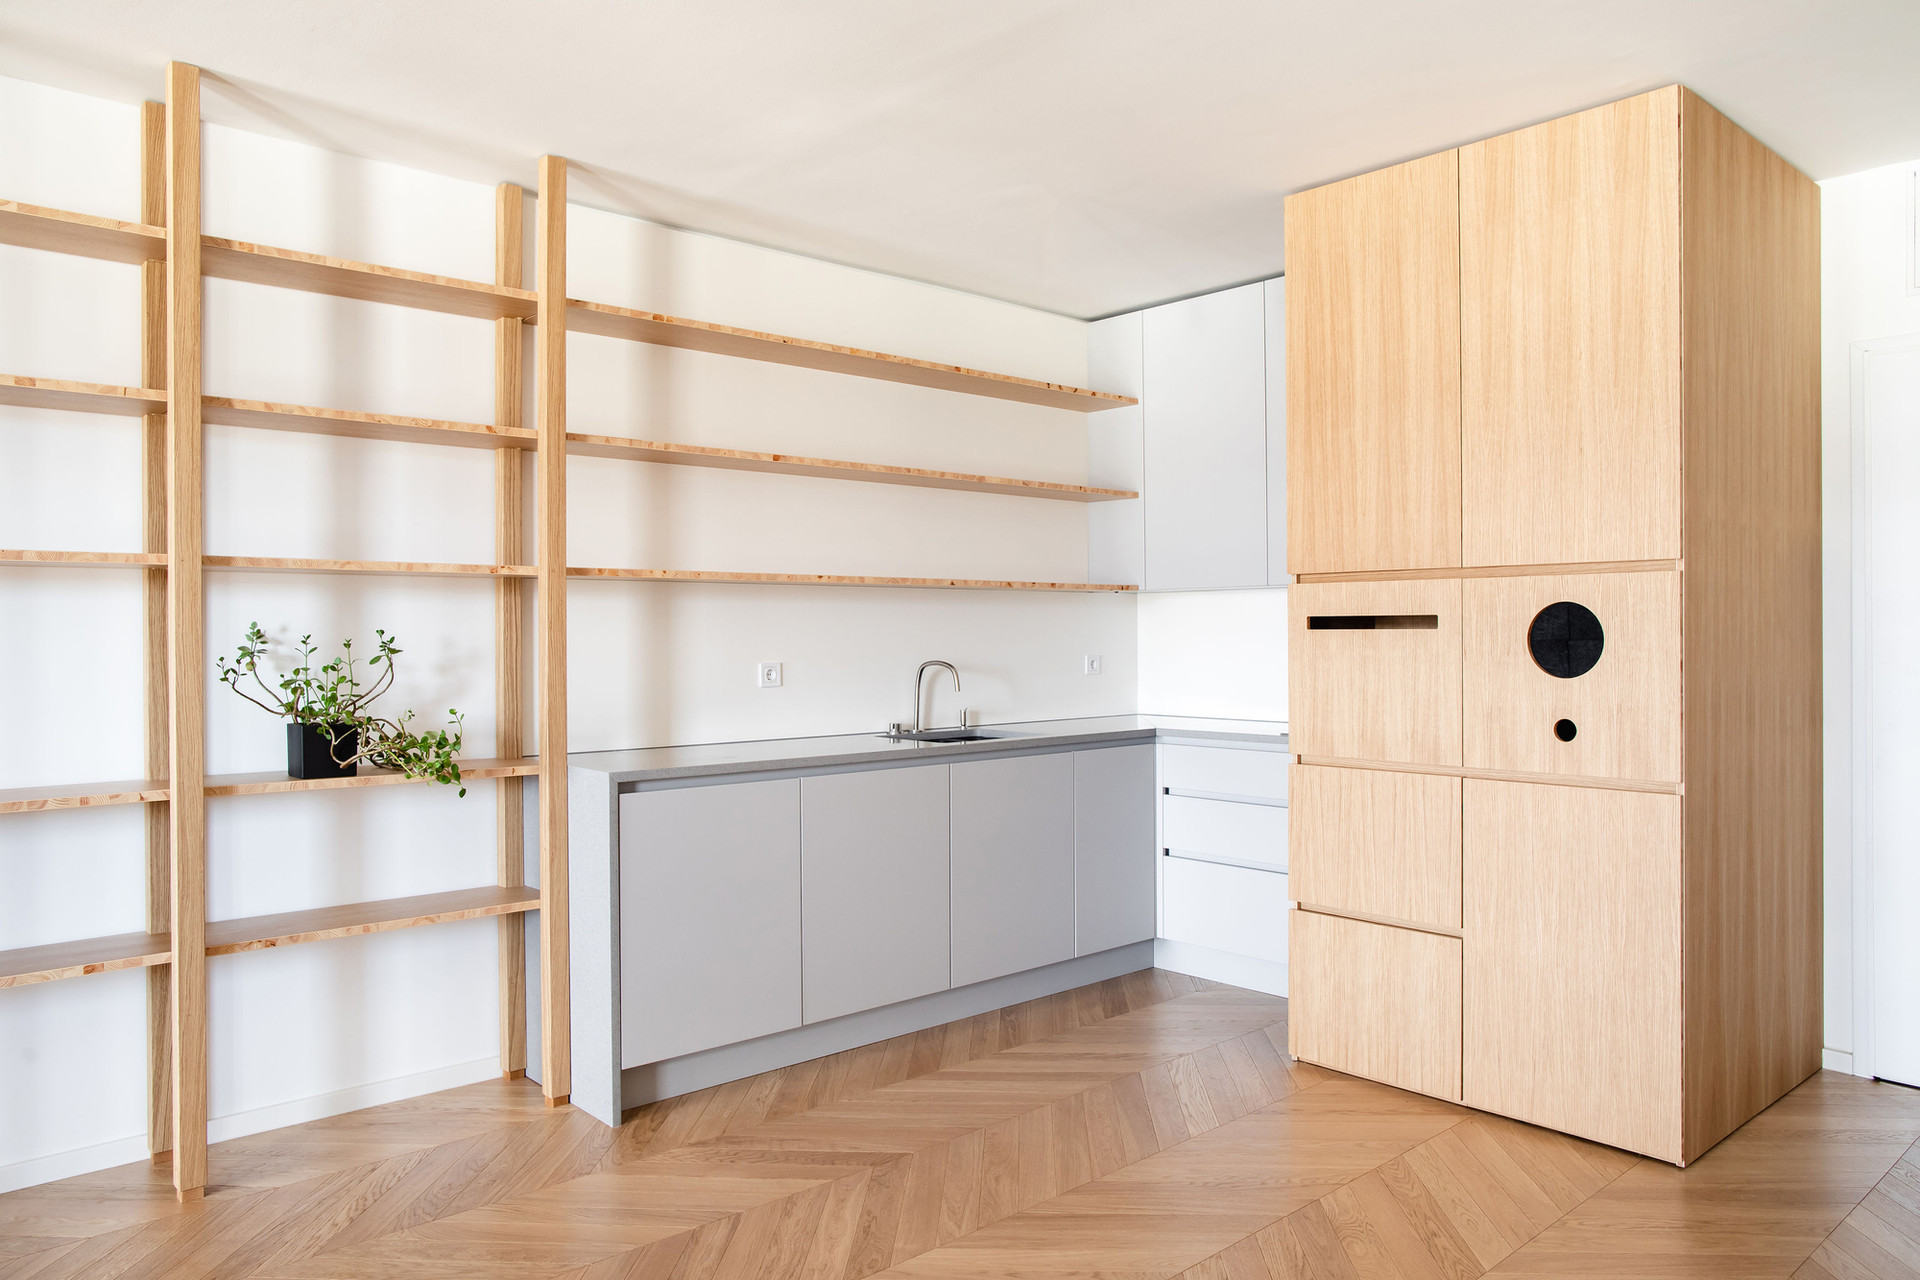 Prostor-14-kuhinja-22.jpg